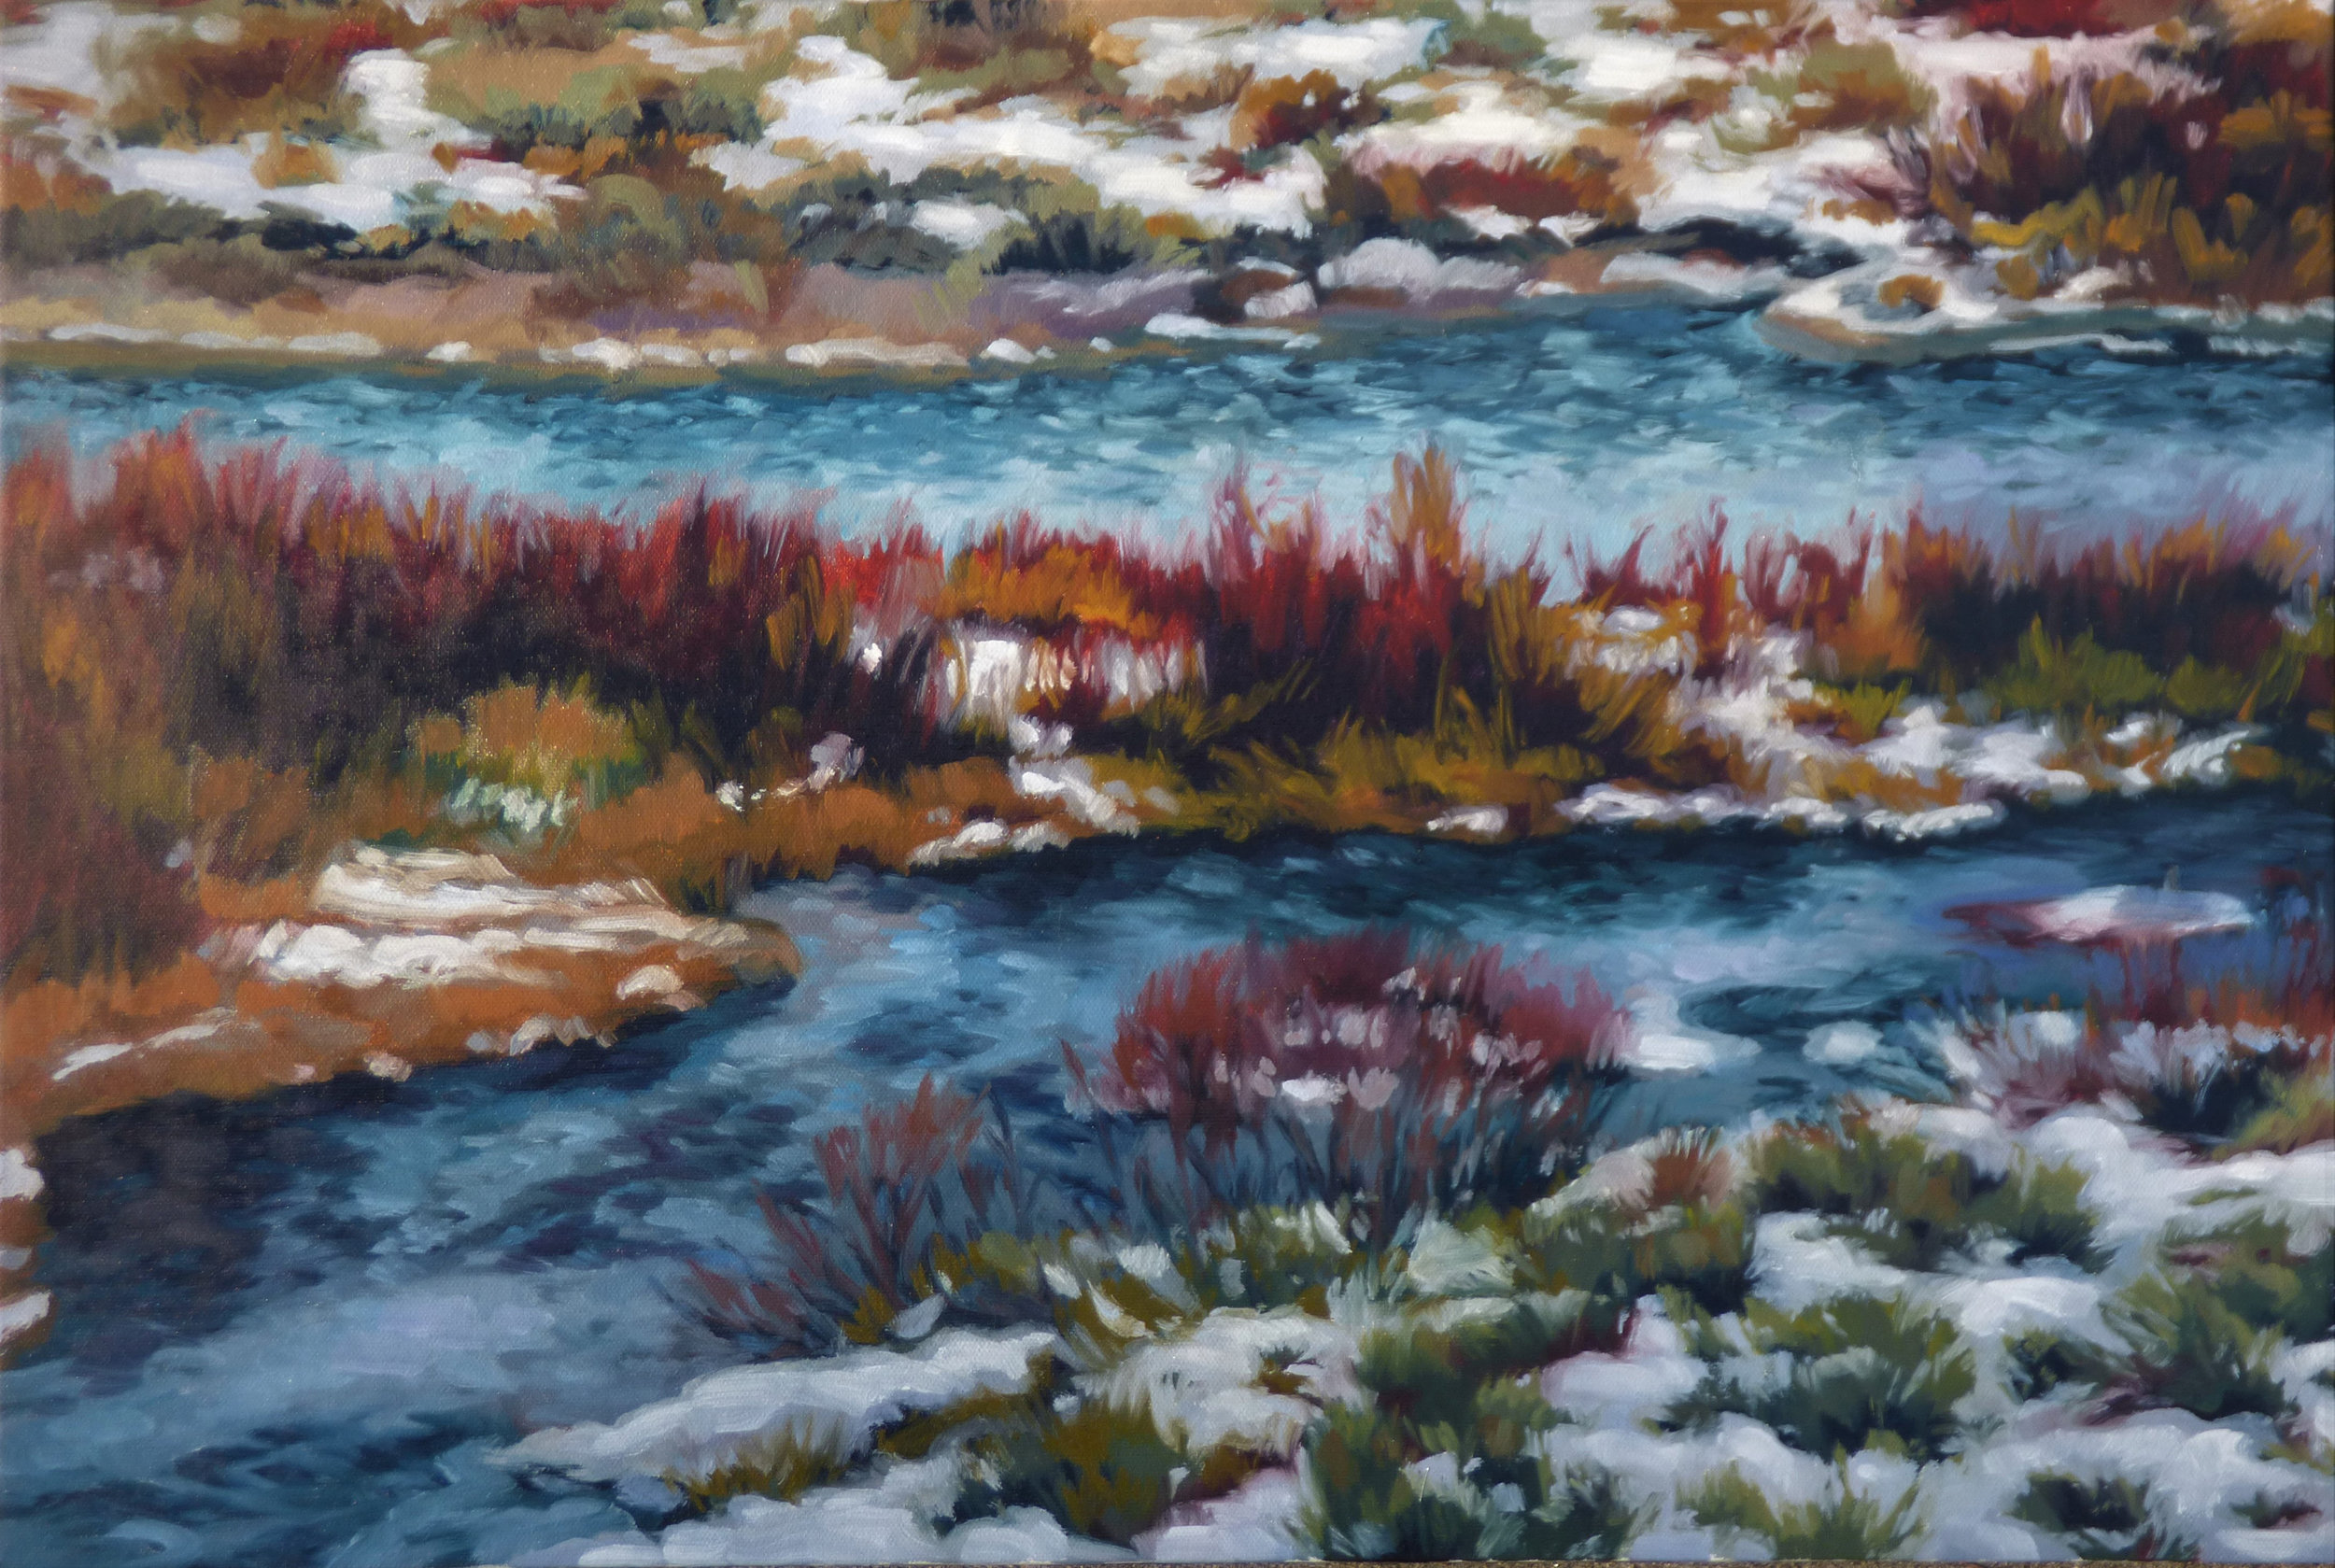 Sawtooth Valley, Salmon River